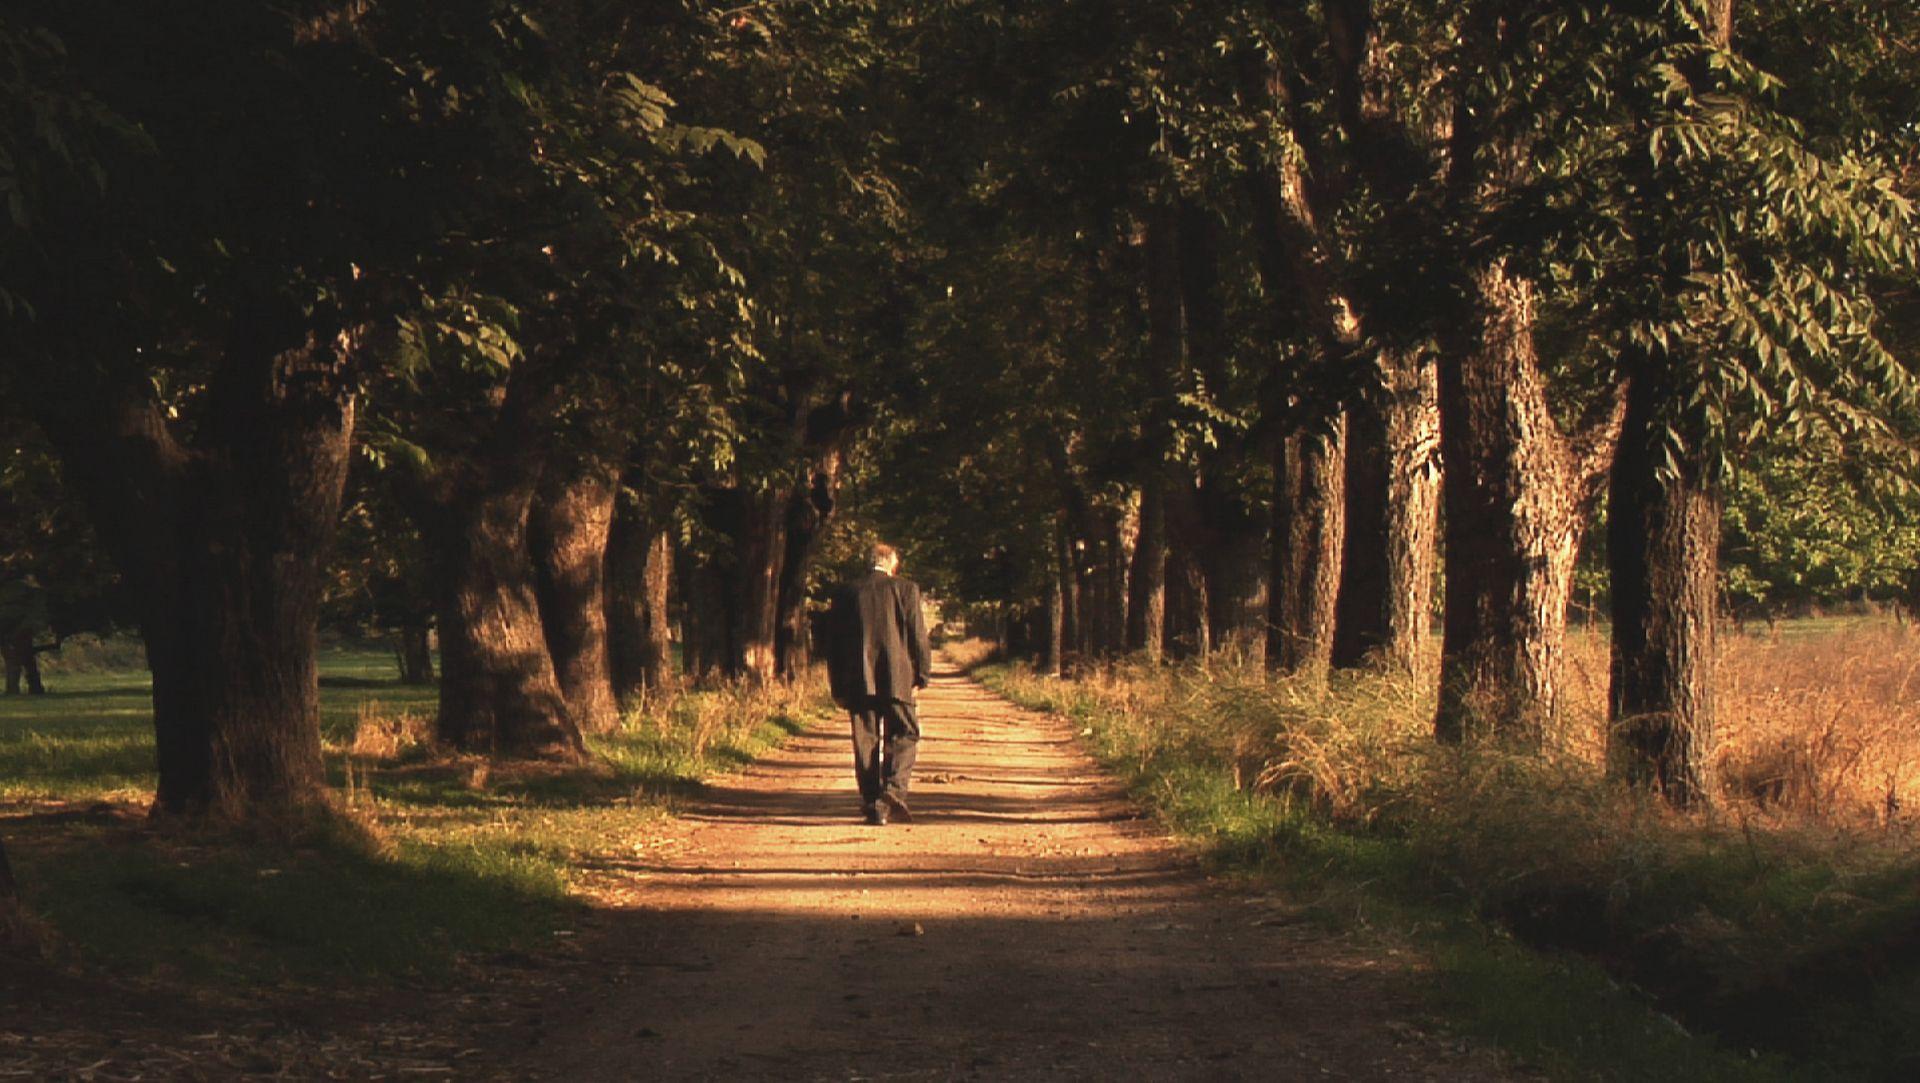 An old Armenian man walks in a forrest in Lebanon in the documentary 23 Kilometres